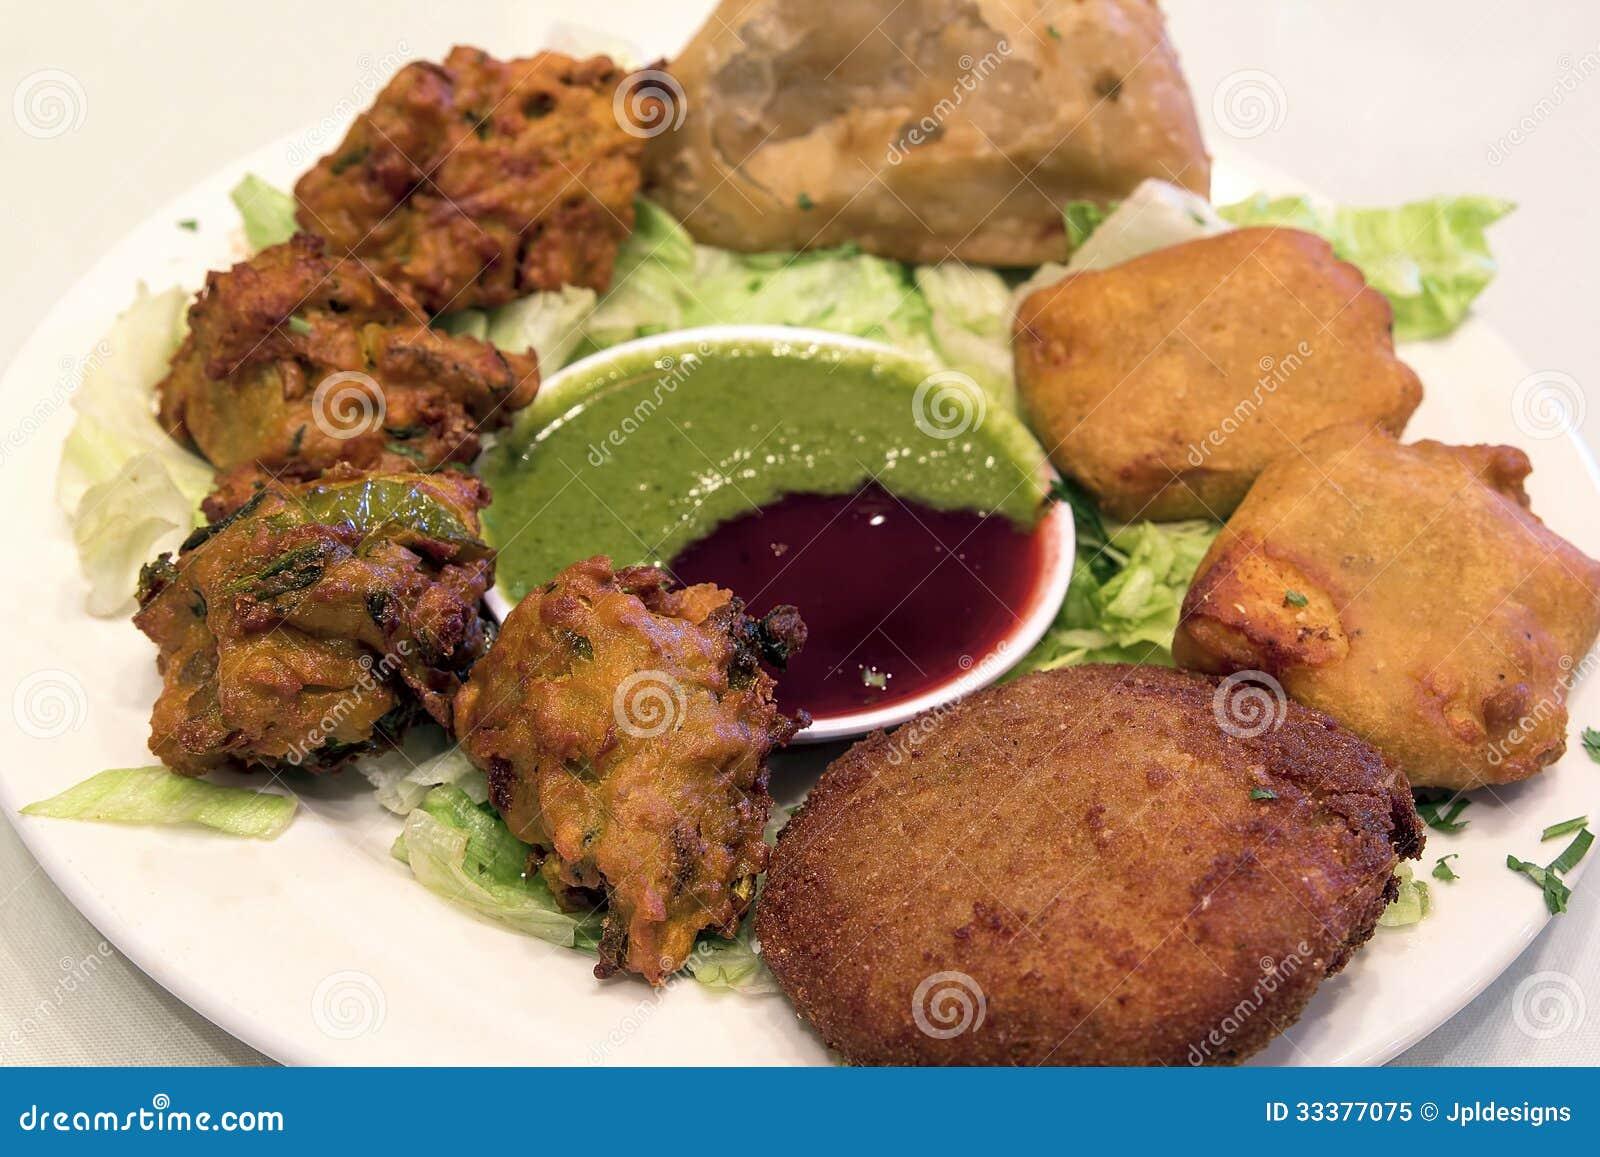 East Indian Food Appetizer Dish Closeup Royalty Free Stock ...